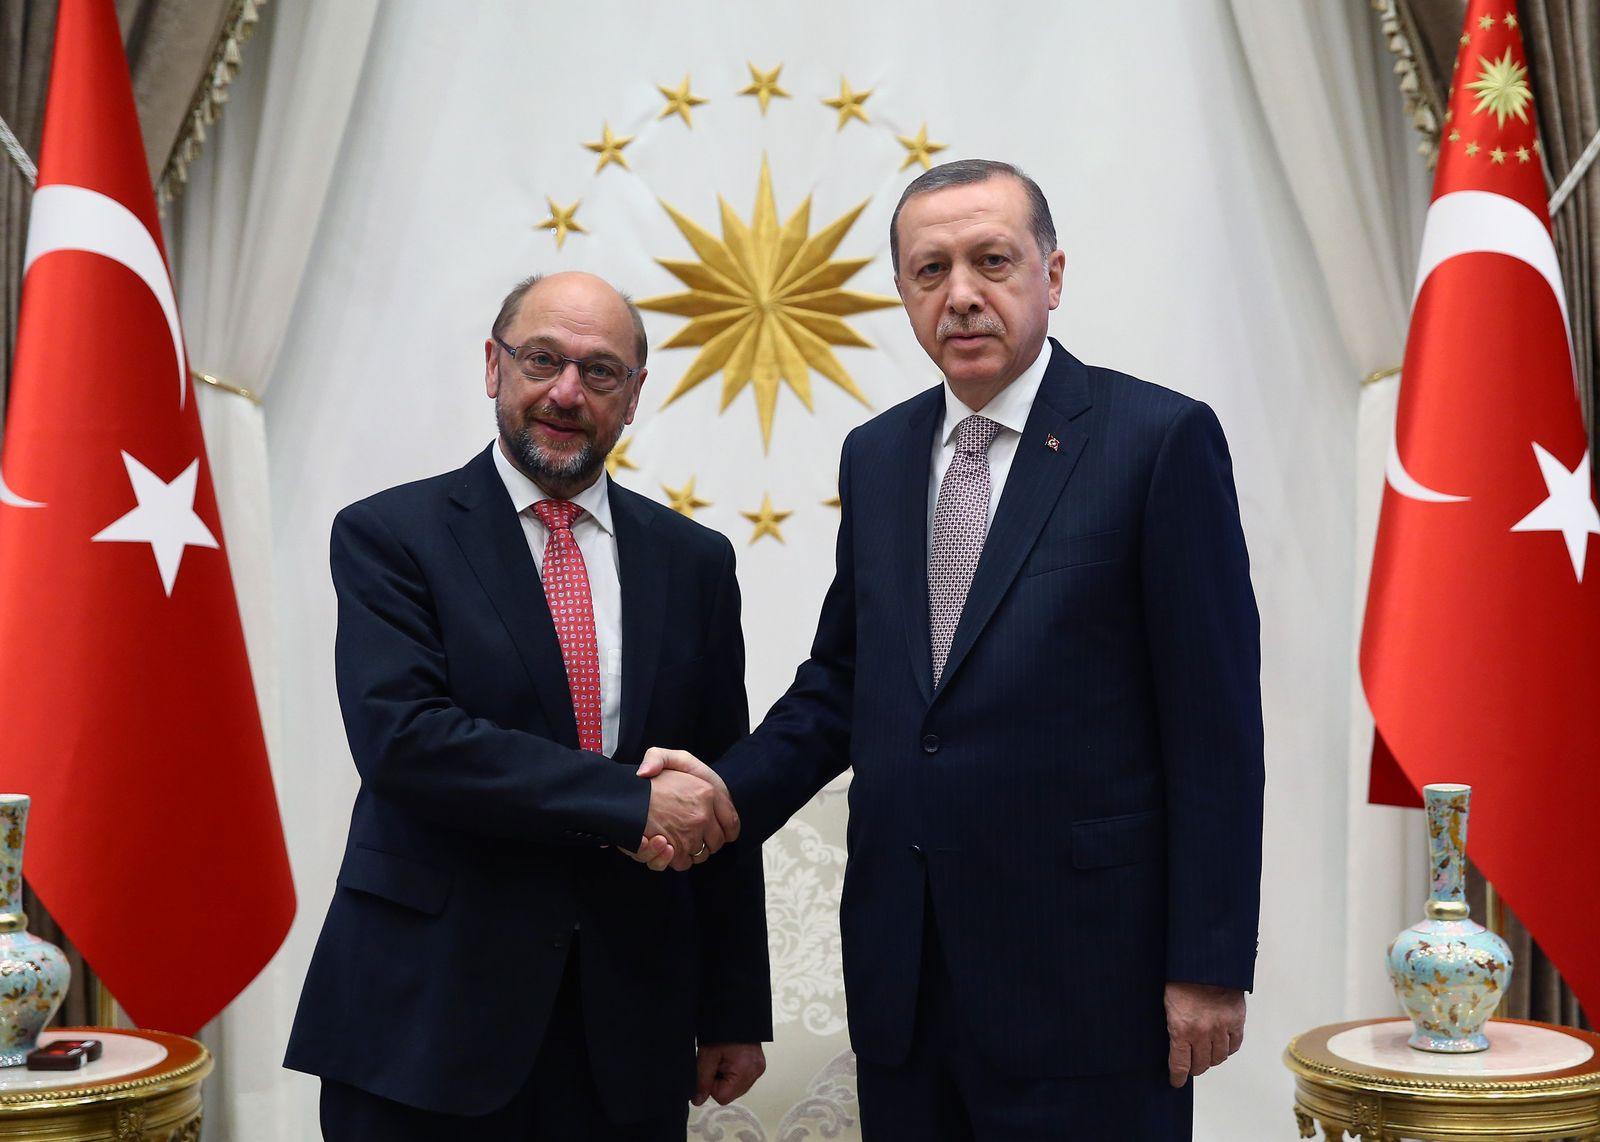 Martin Schulz / Recep Tayyip Erdogan